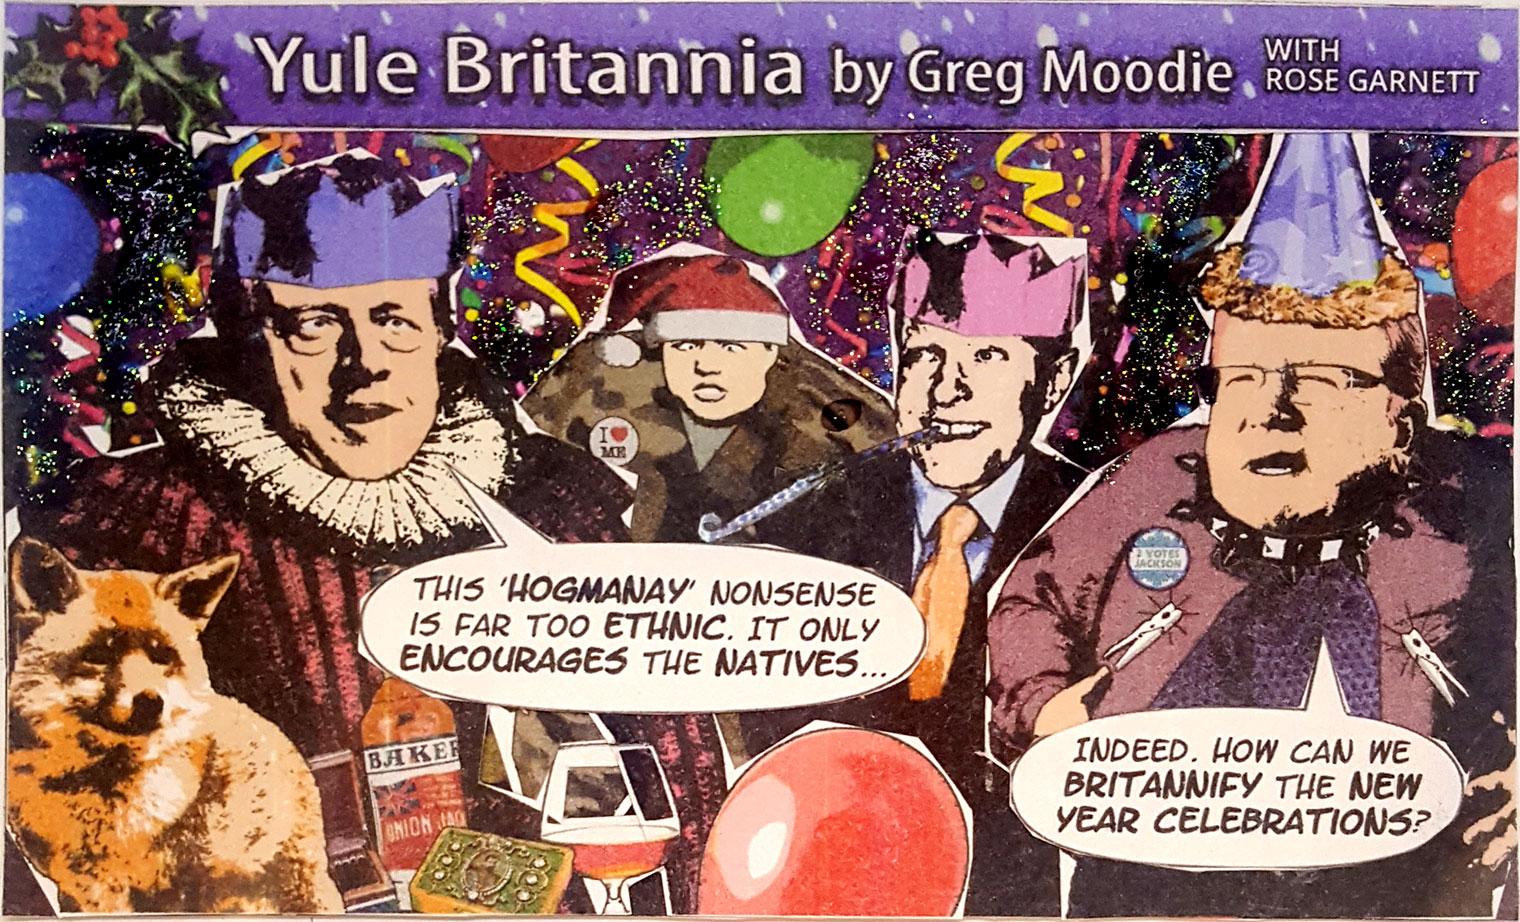 Yule Britannia